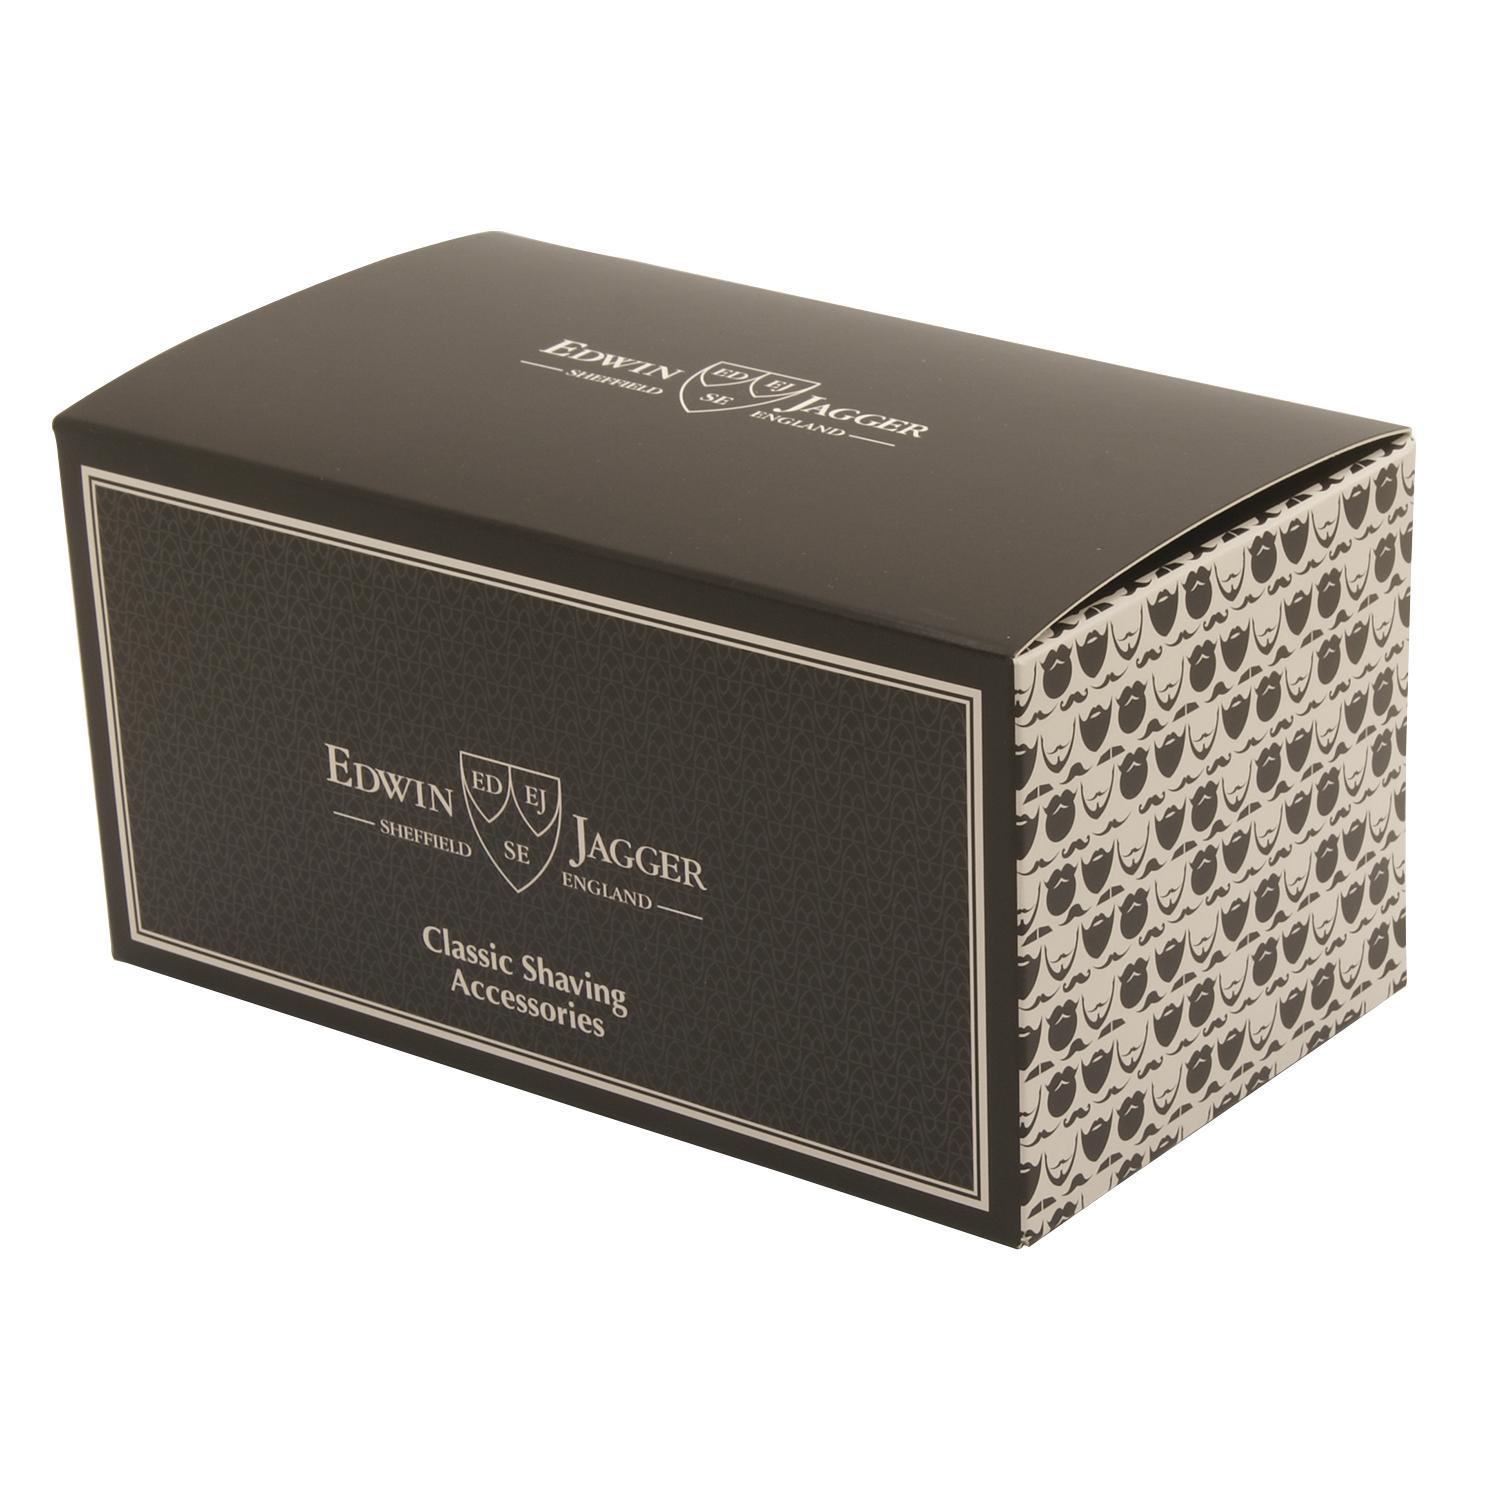 Edwin Jagger – Grey & Chrome 3 Piece DE Safety Razor Shaving Set in Gift Box